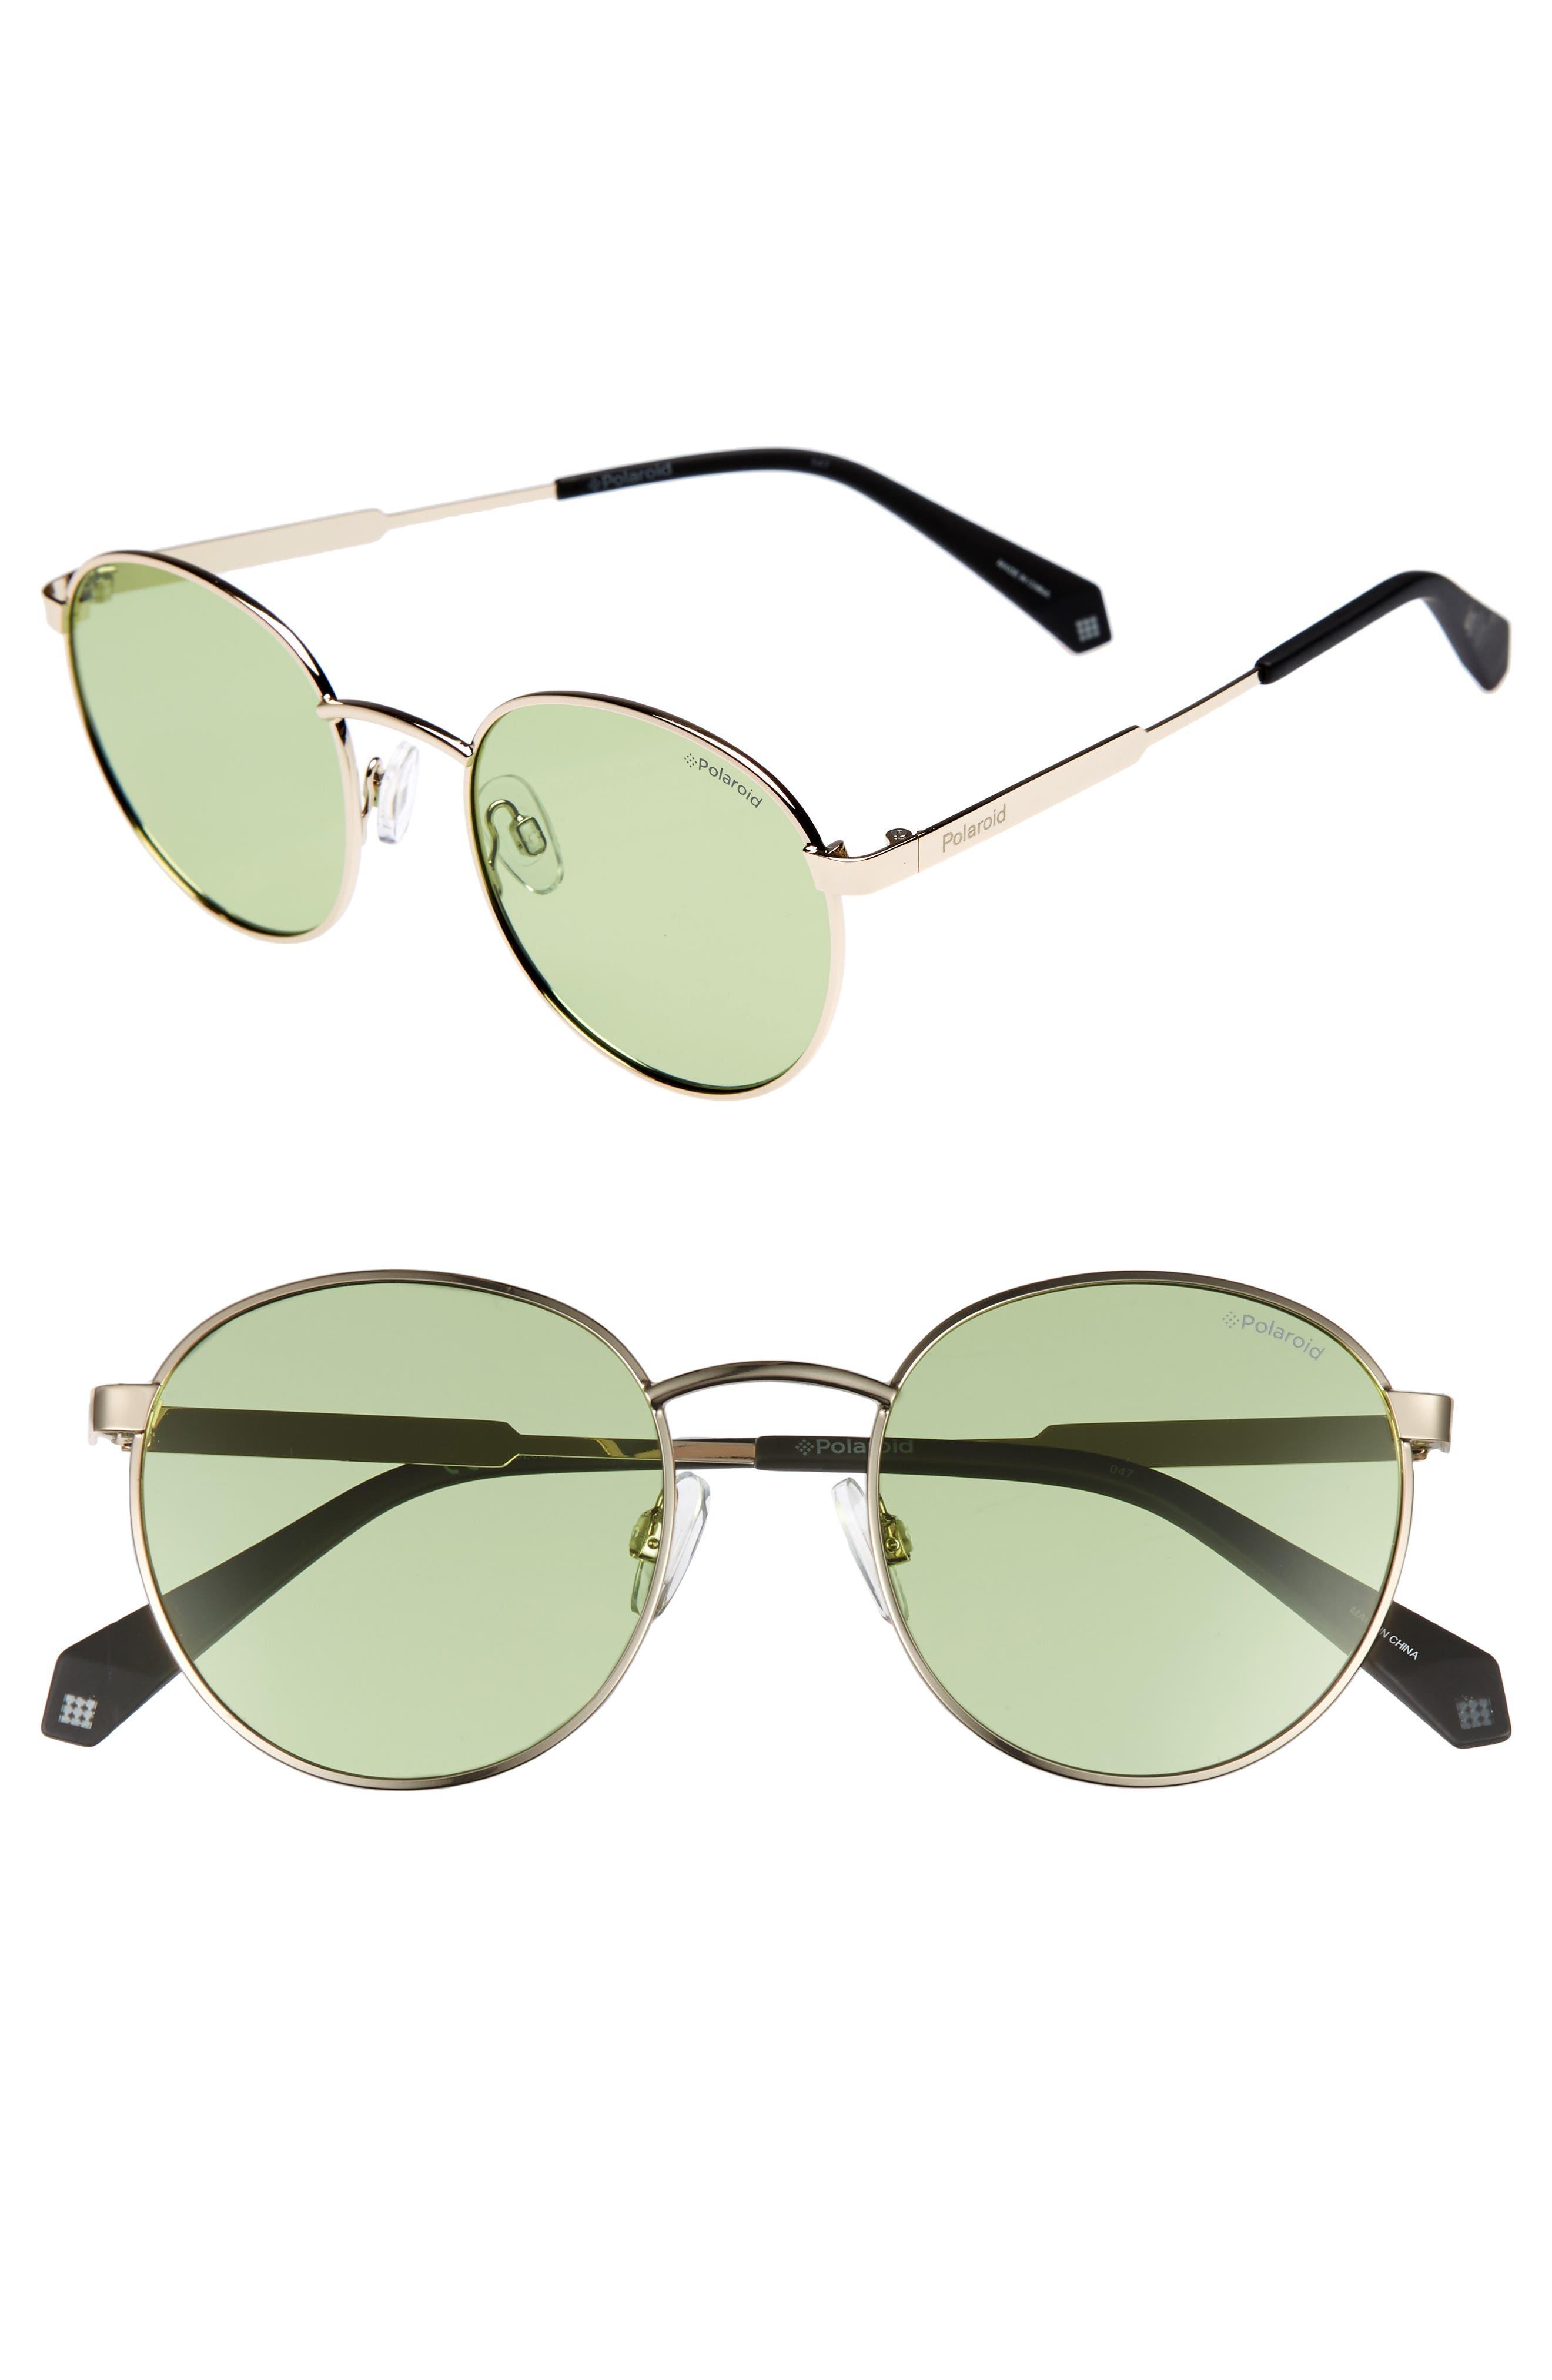 51mm Round Retro Polarized Sunglasses,                             Main thumbnail 1, color,                             Green